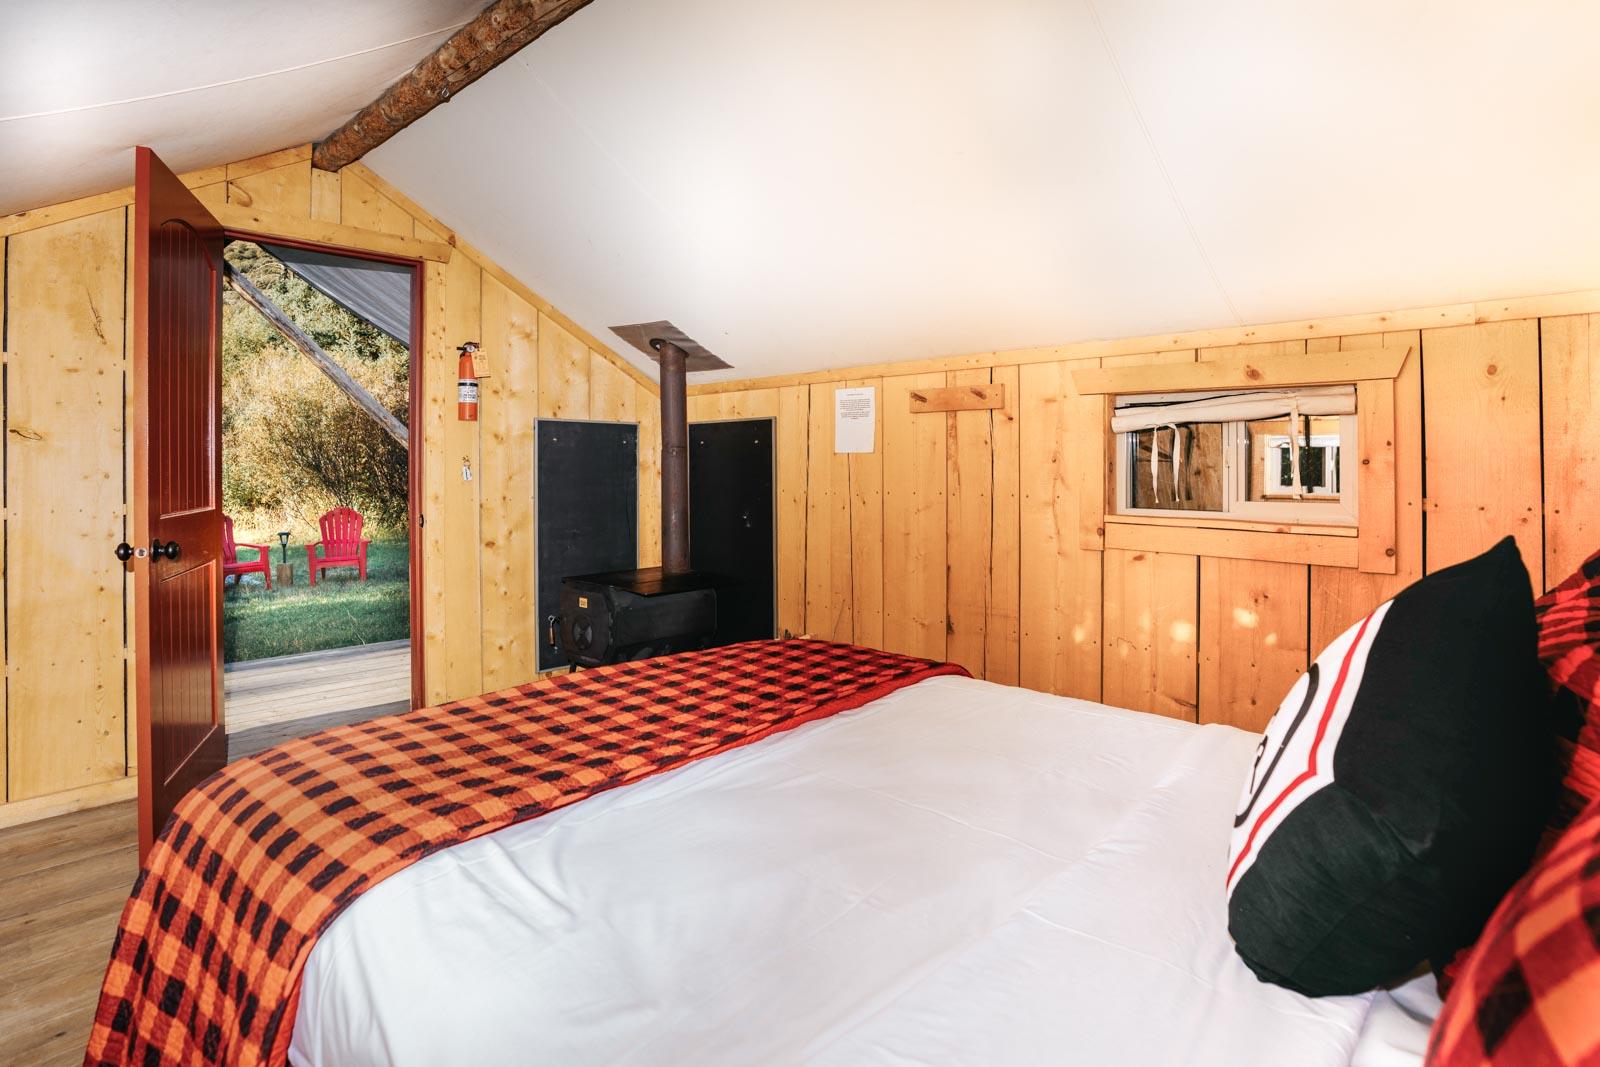 jackson-hole-lodging-deals-idaho-glamping-cabins